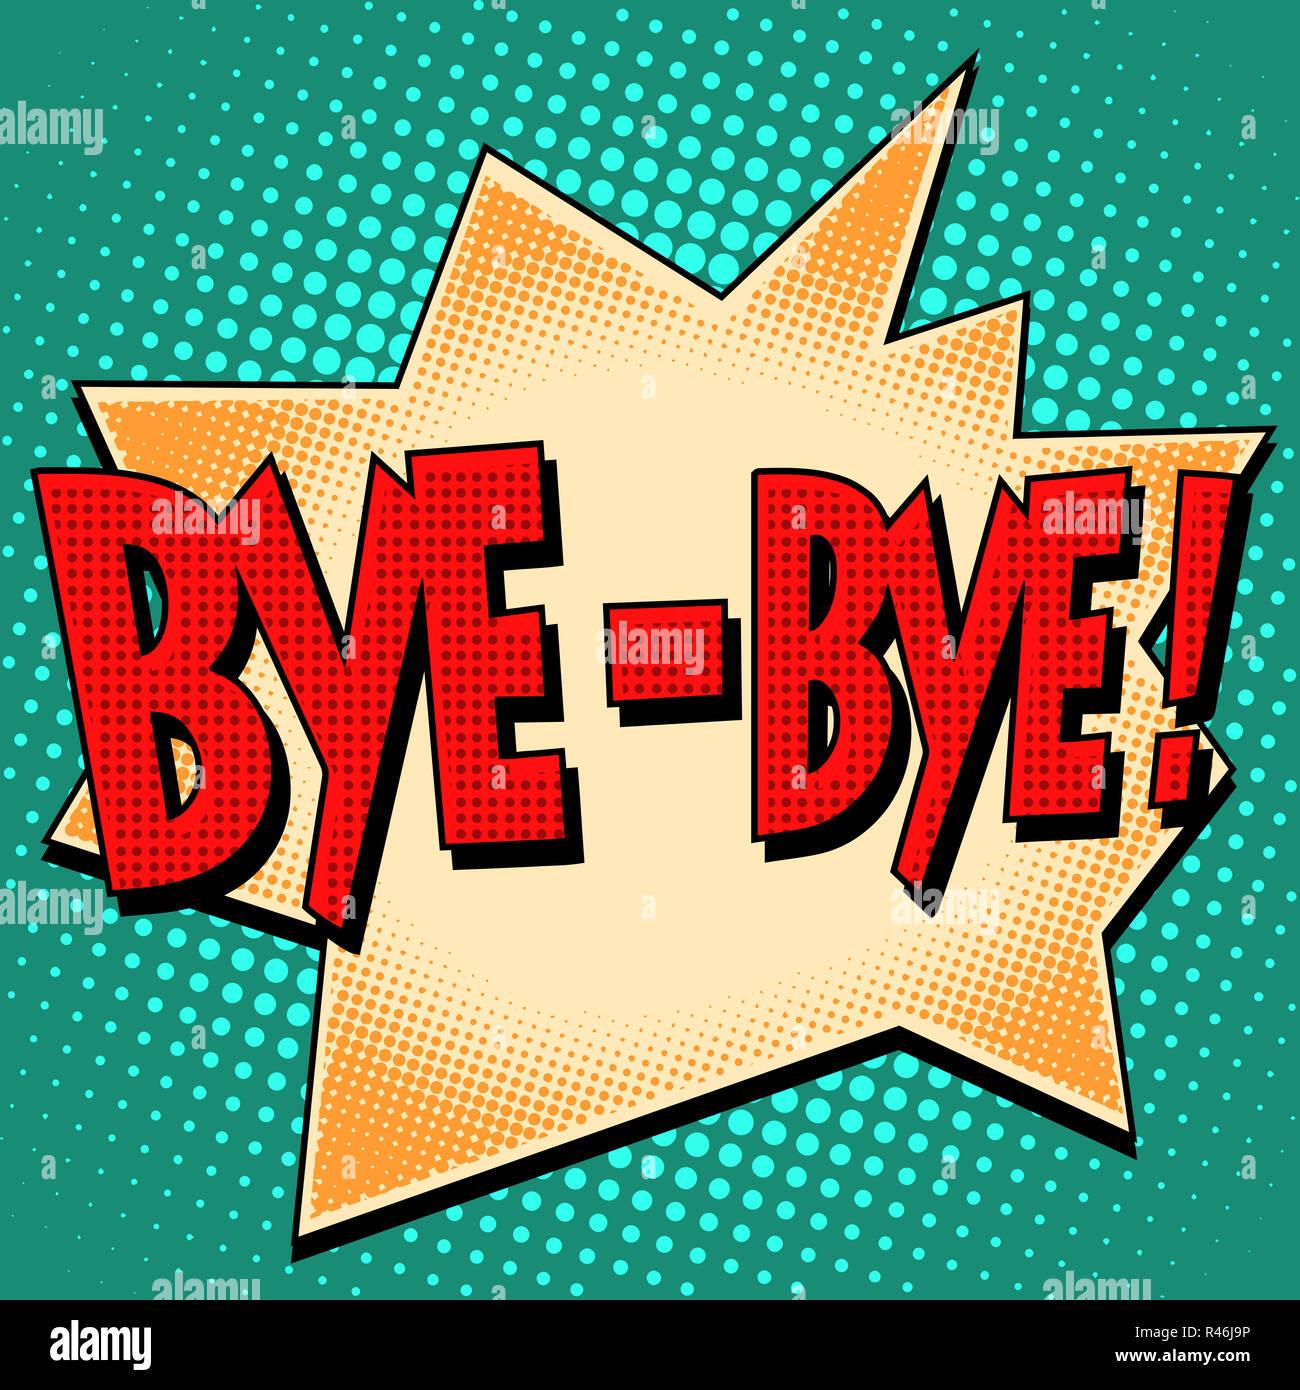 Bye Bye - série (1968) - SensCritique